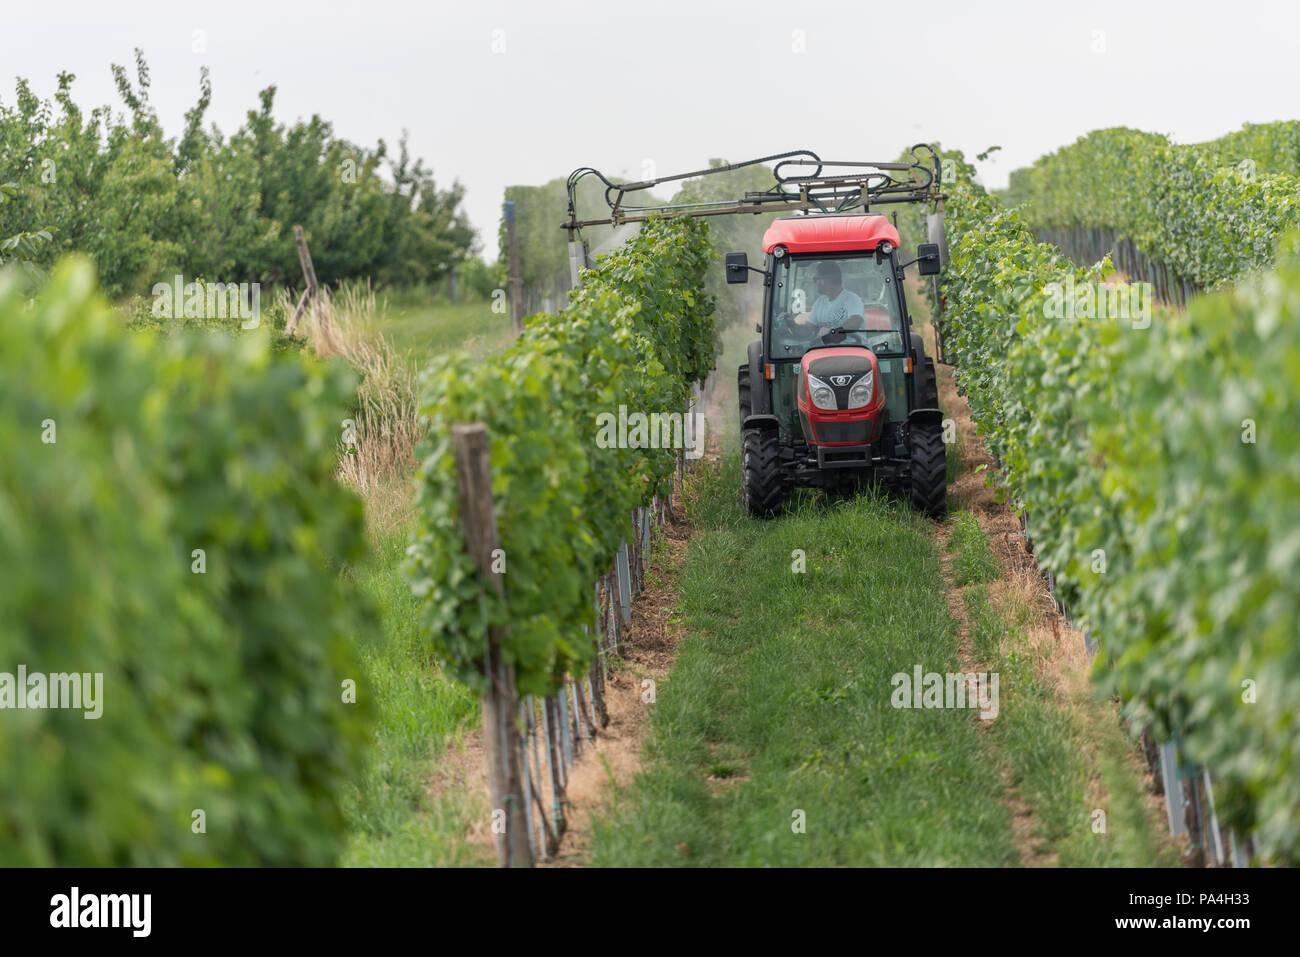 viticulture at Furth-Palt, Kremstal, Lower Austria, Austria Stock Photo